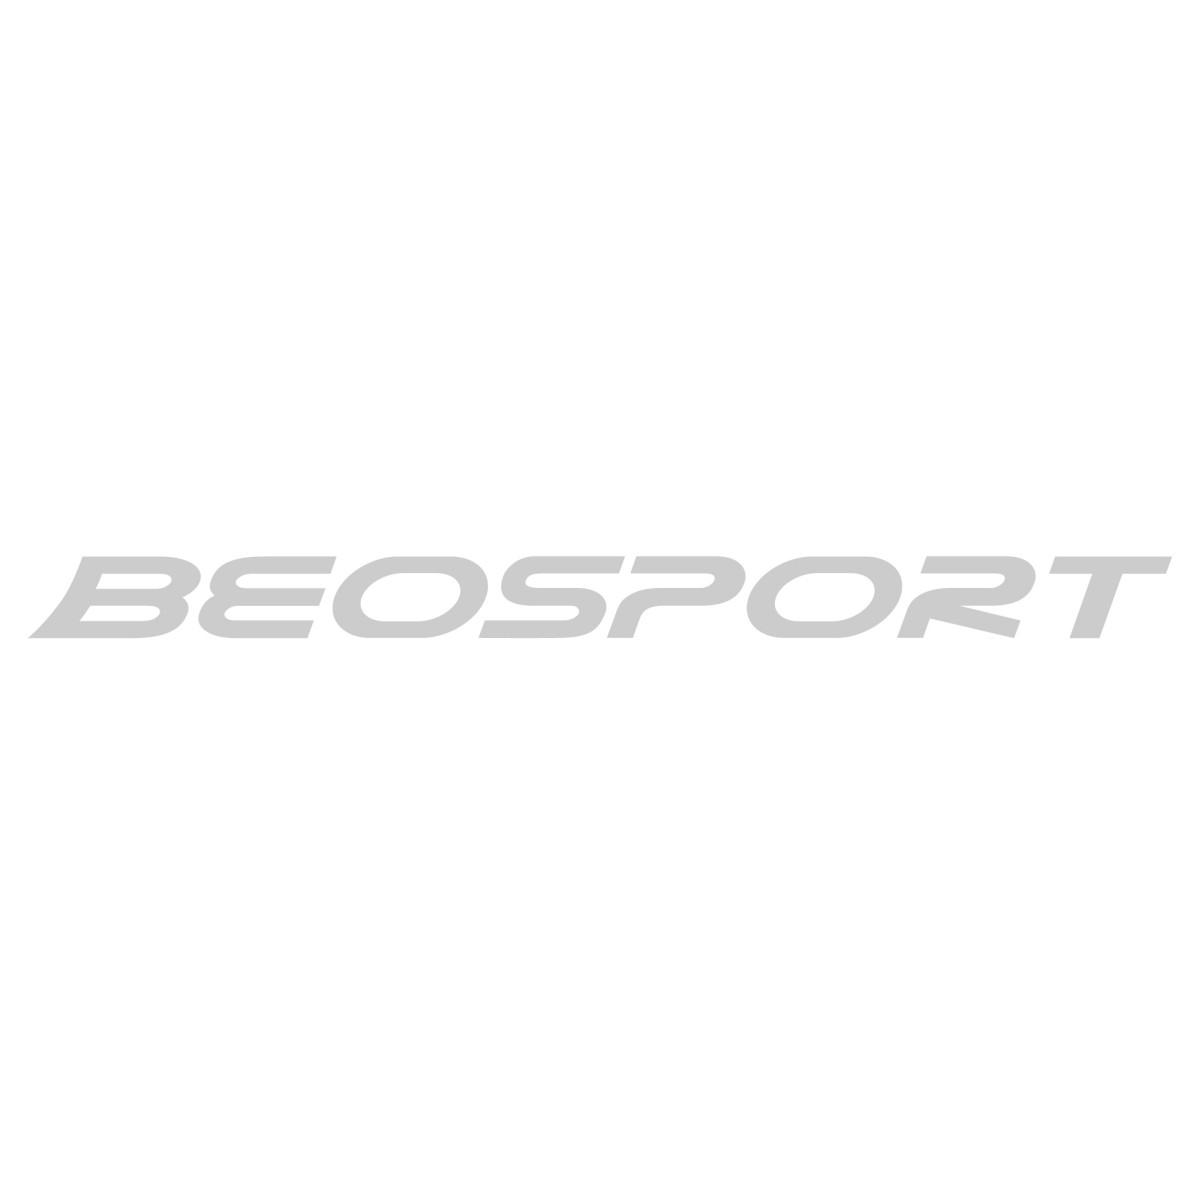 Wilson Slice Tech majica